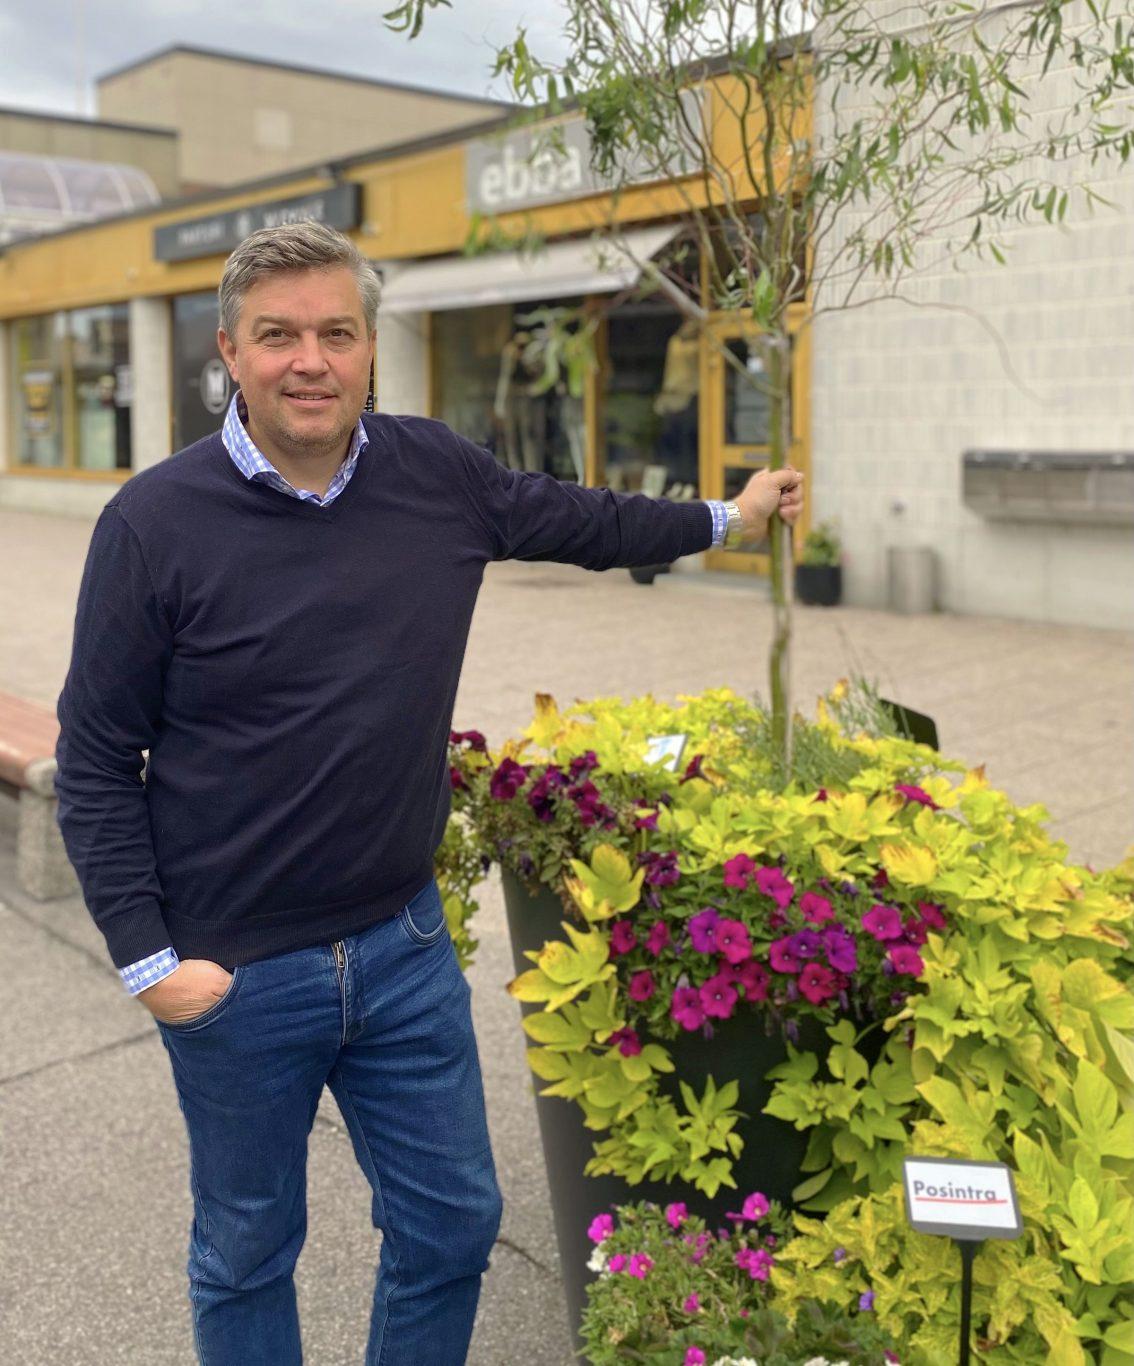 Fredrik Pressler, Posintra Oy